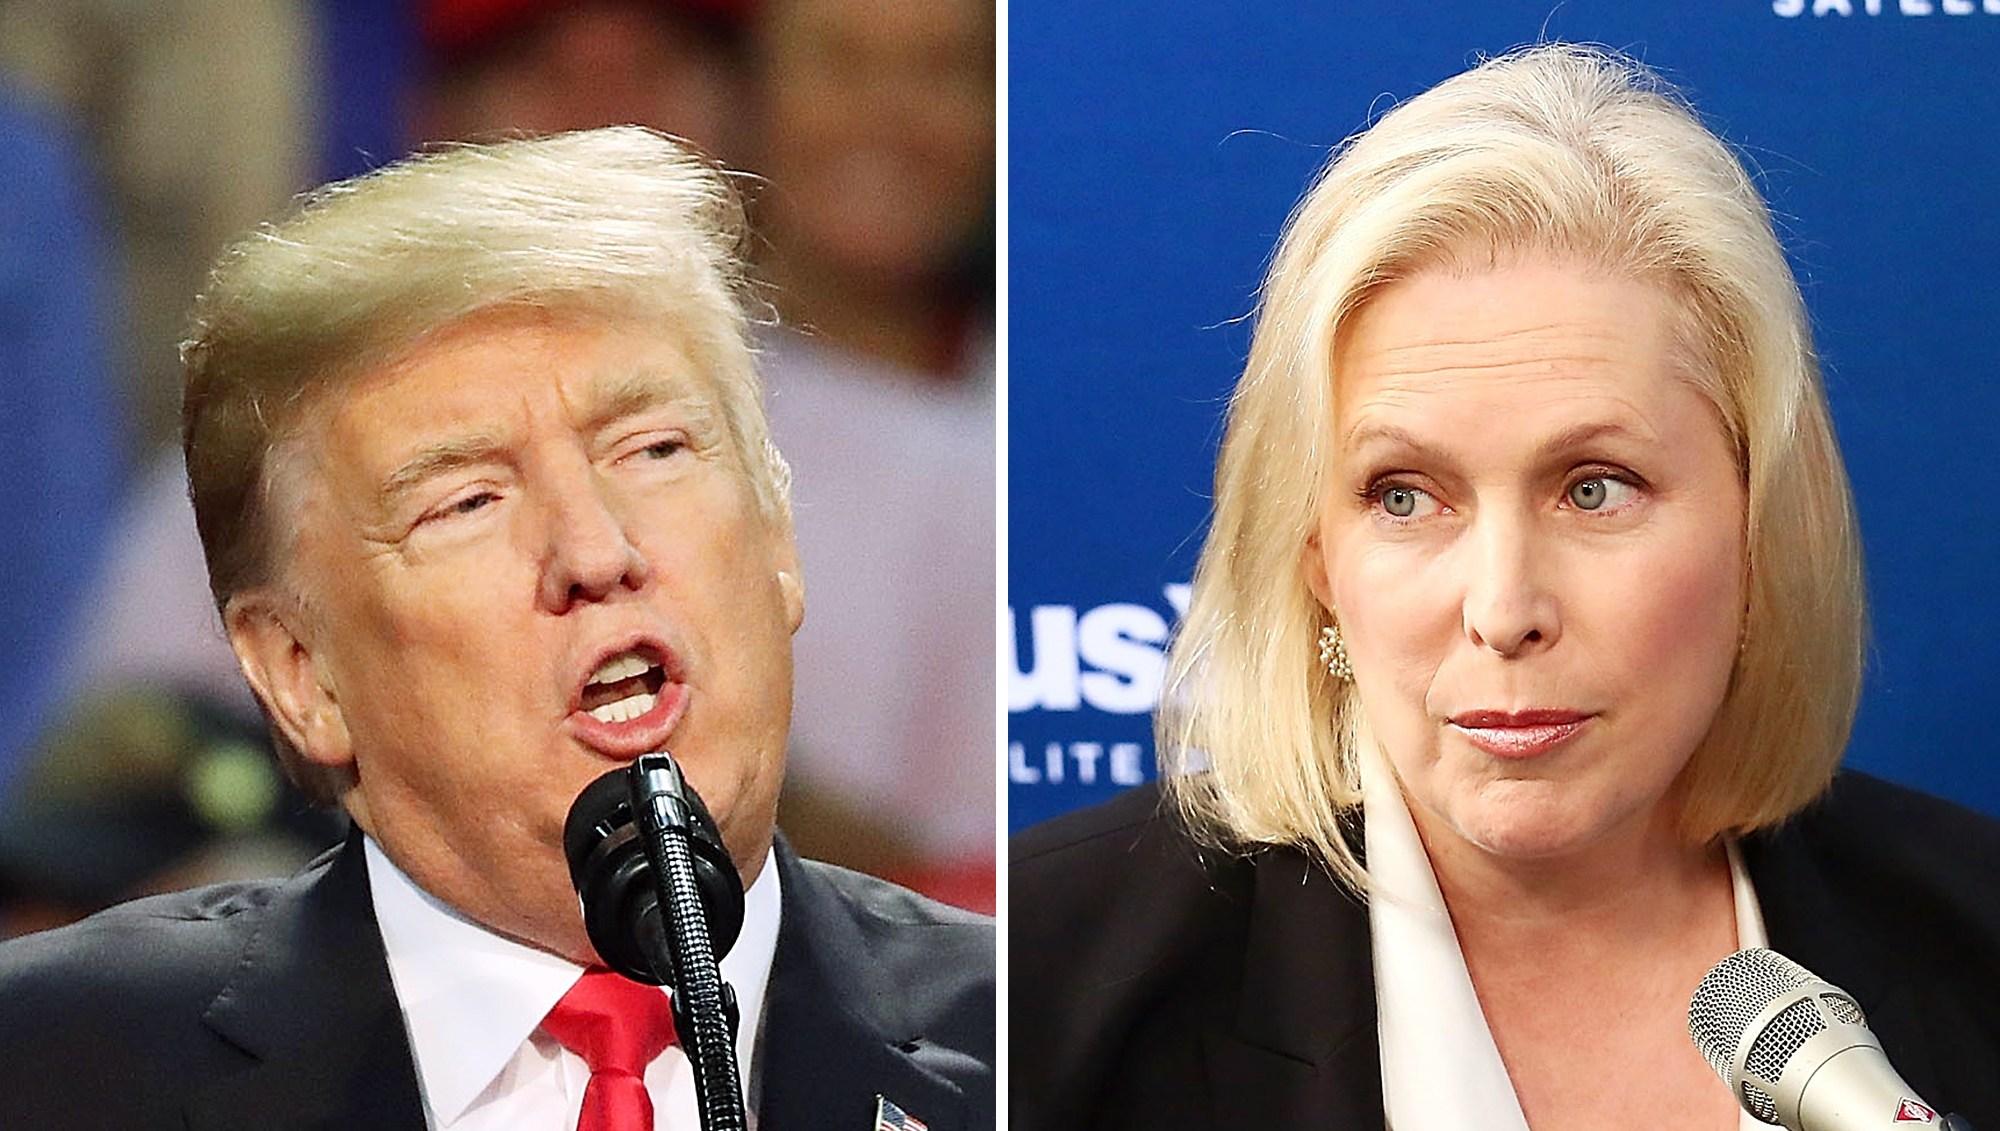 Donald Trump and Kirsten Gillibrand